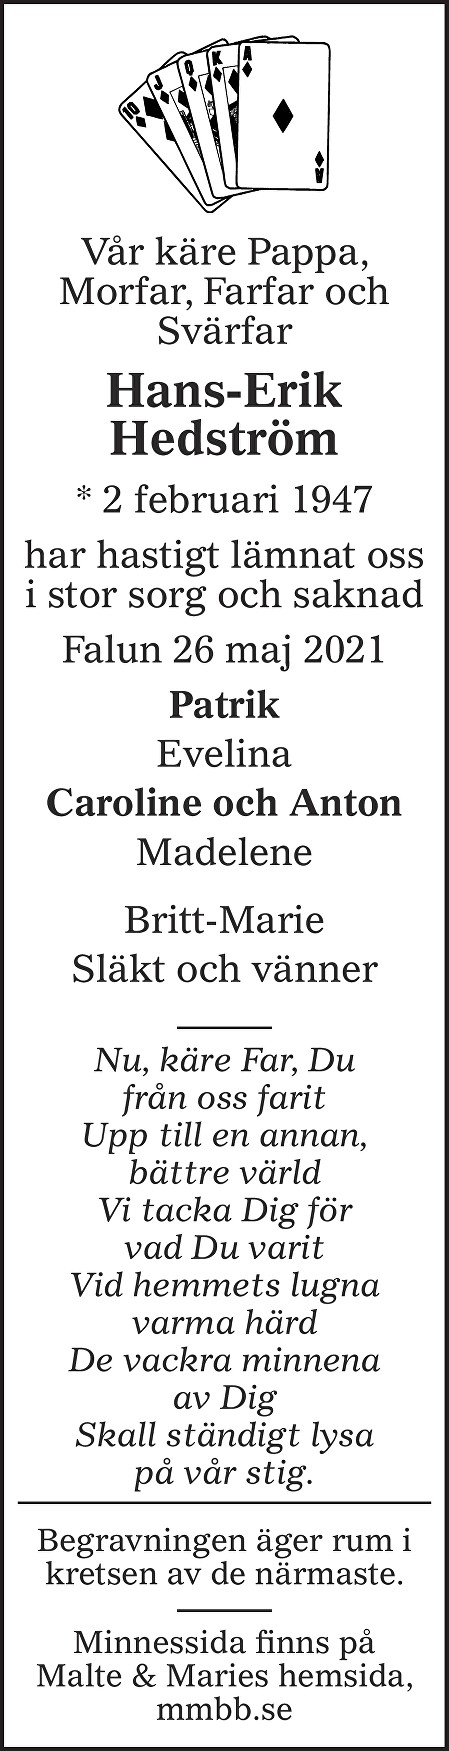 Hans-Erik Hedström Death notice